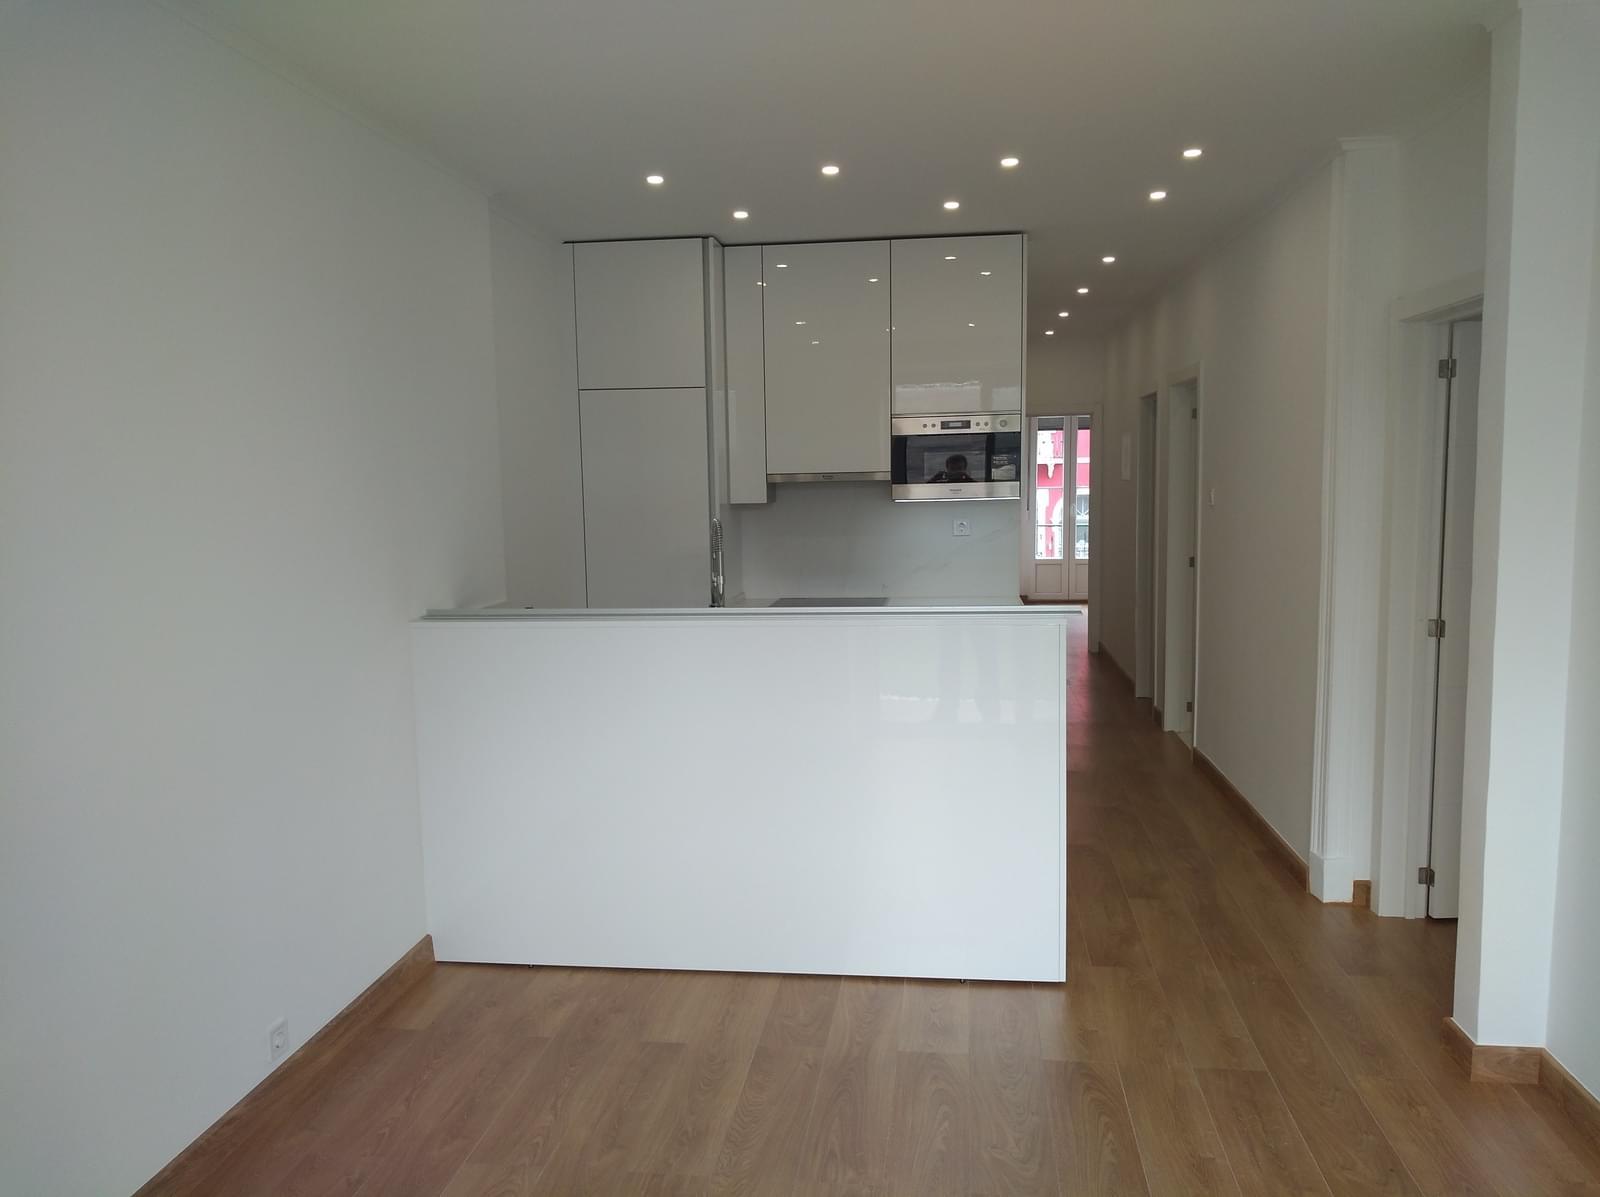 pf17316-apartamento-t2-lisboa-c890fa41-2d83-43b9-aeff-443231ceac48